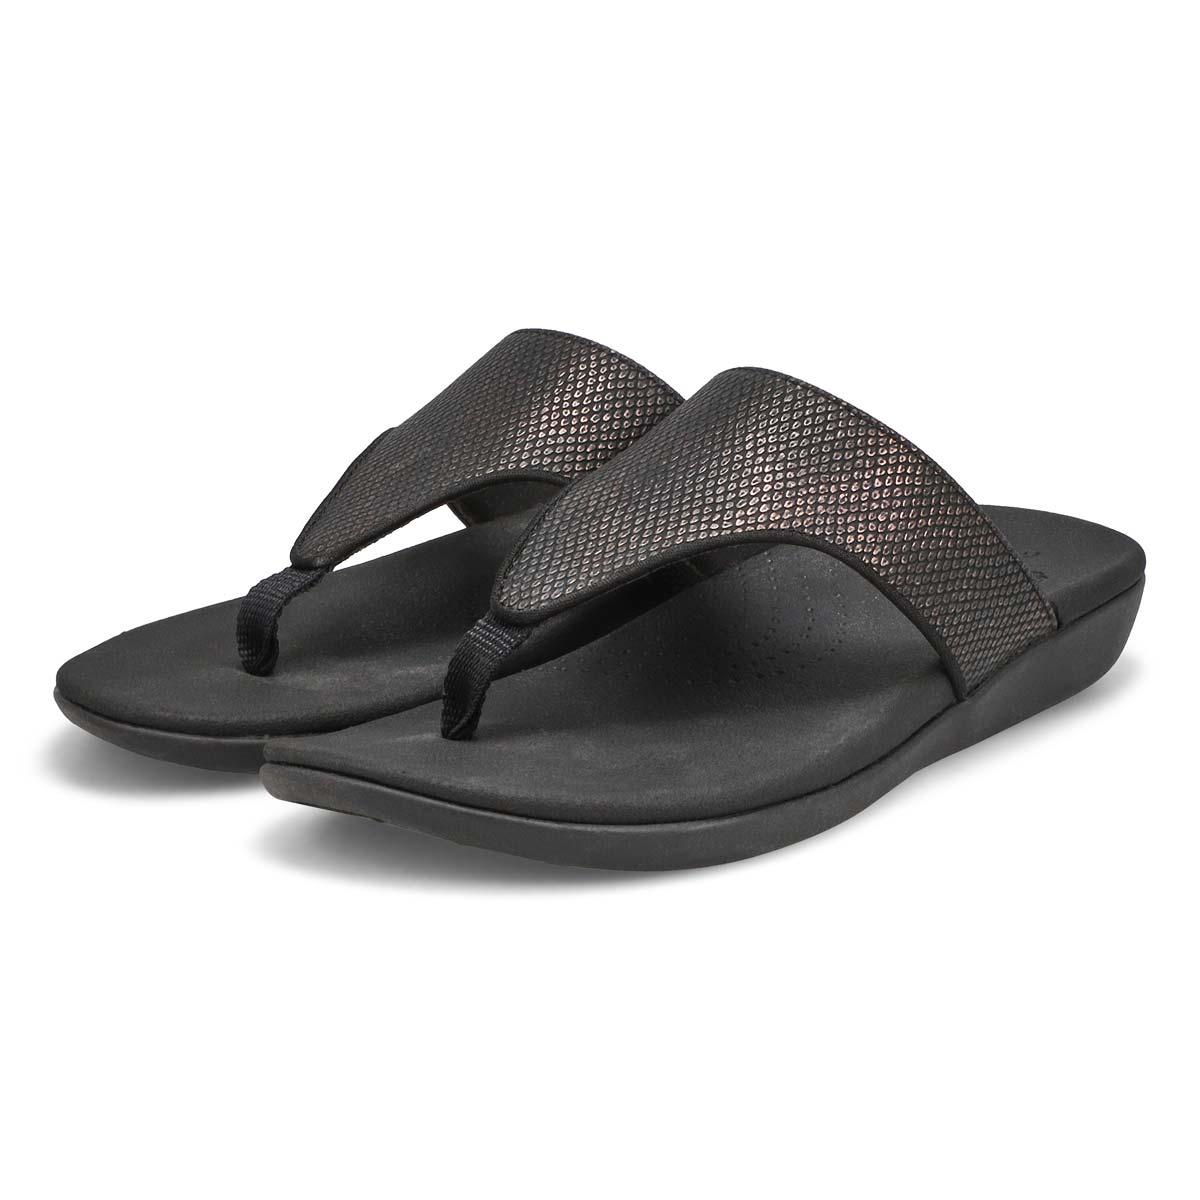 Women's Brio Vibe Thong Sandal - Black Snake